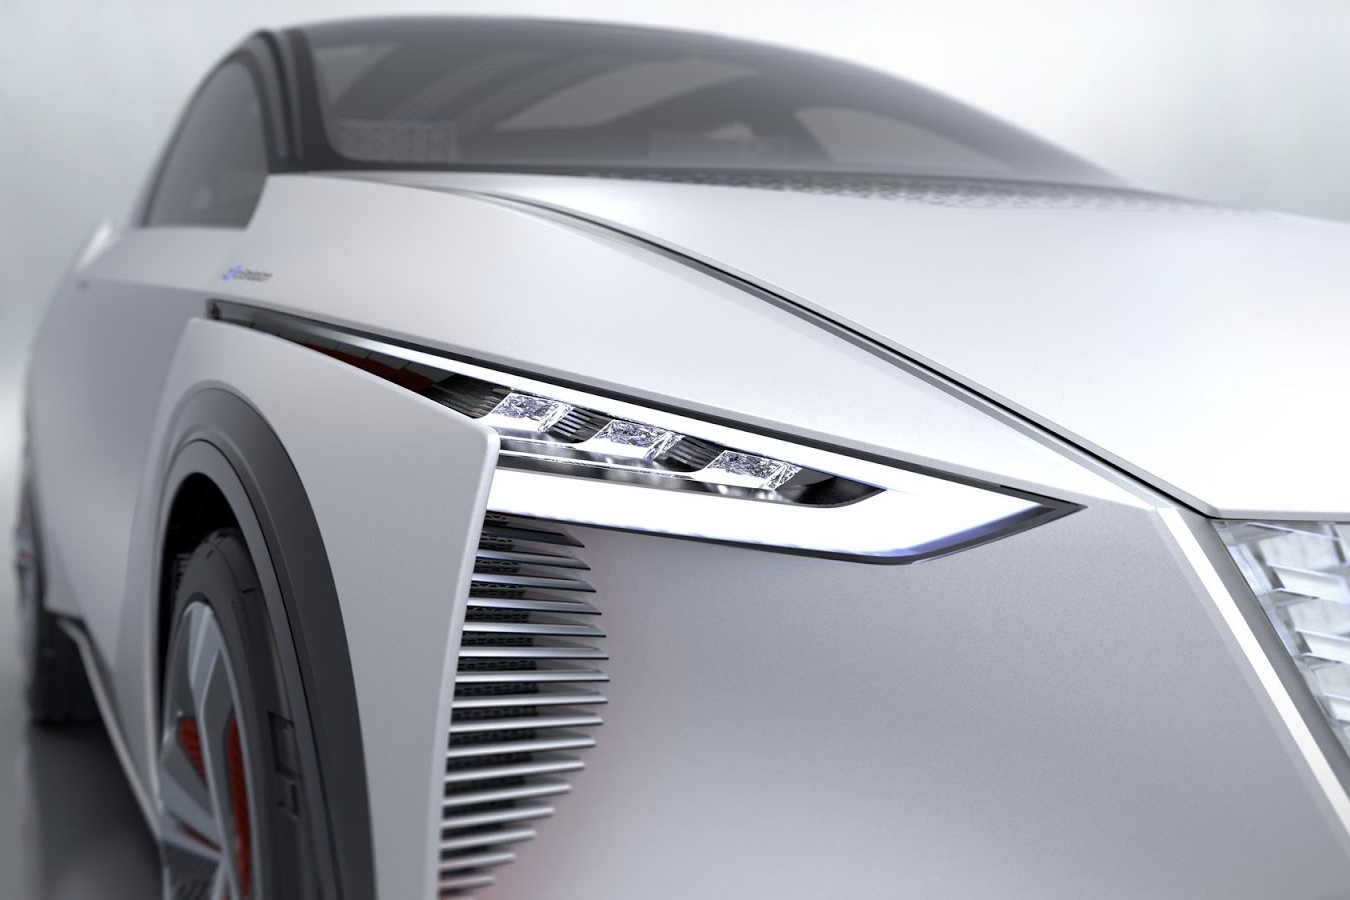 SXdrv, Automotive, Cars, Nissan Concept, Nissan IMx, Nissan,Tokyo Motor Show,